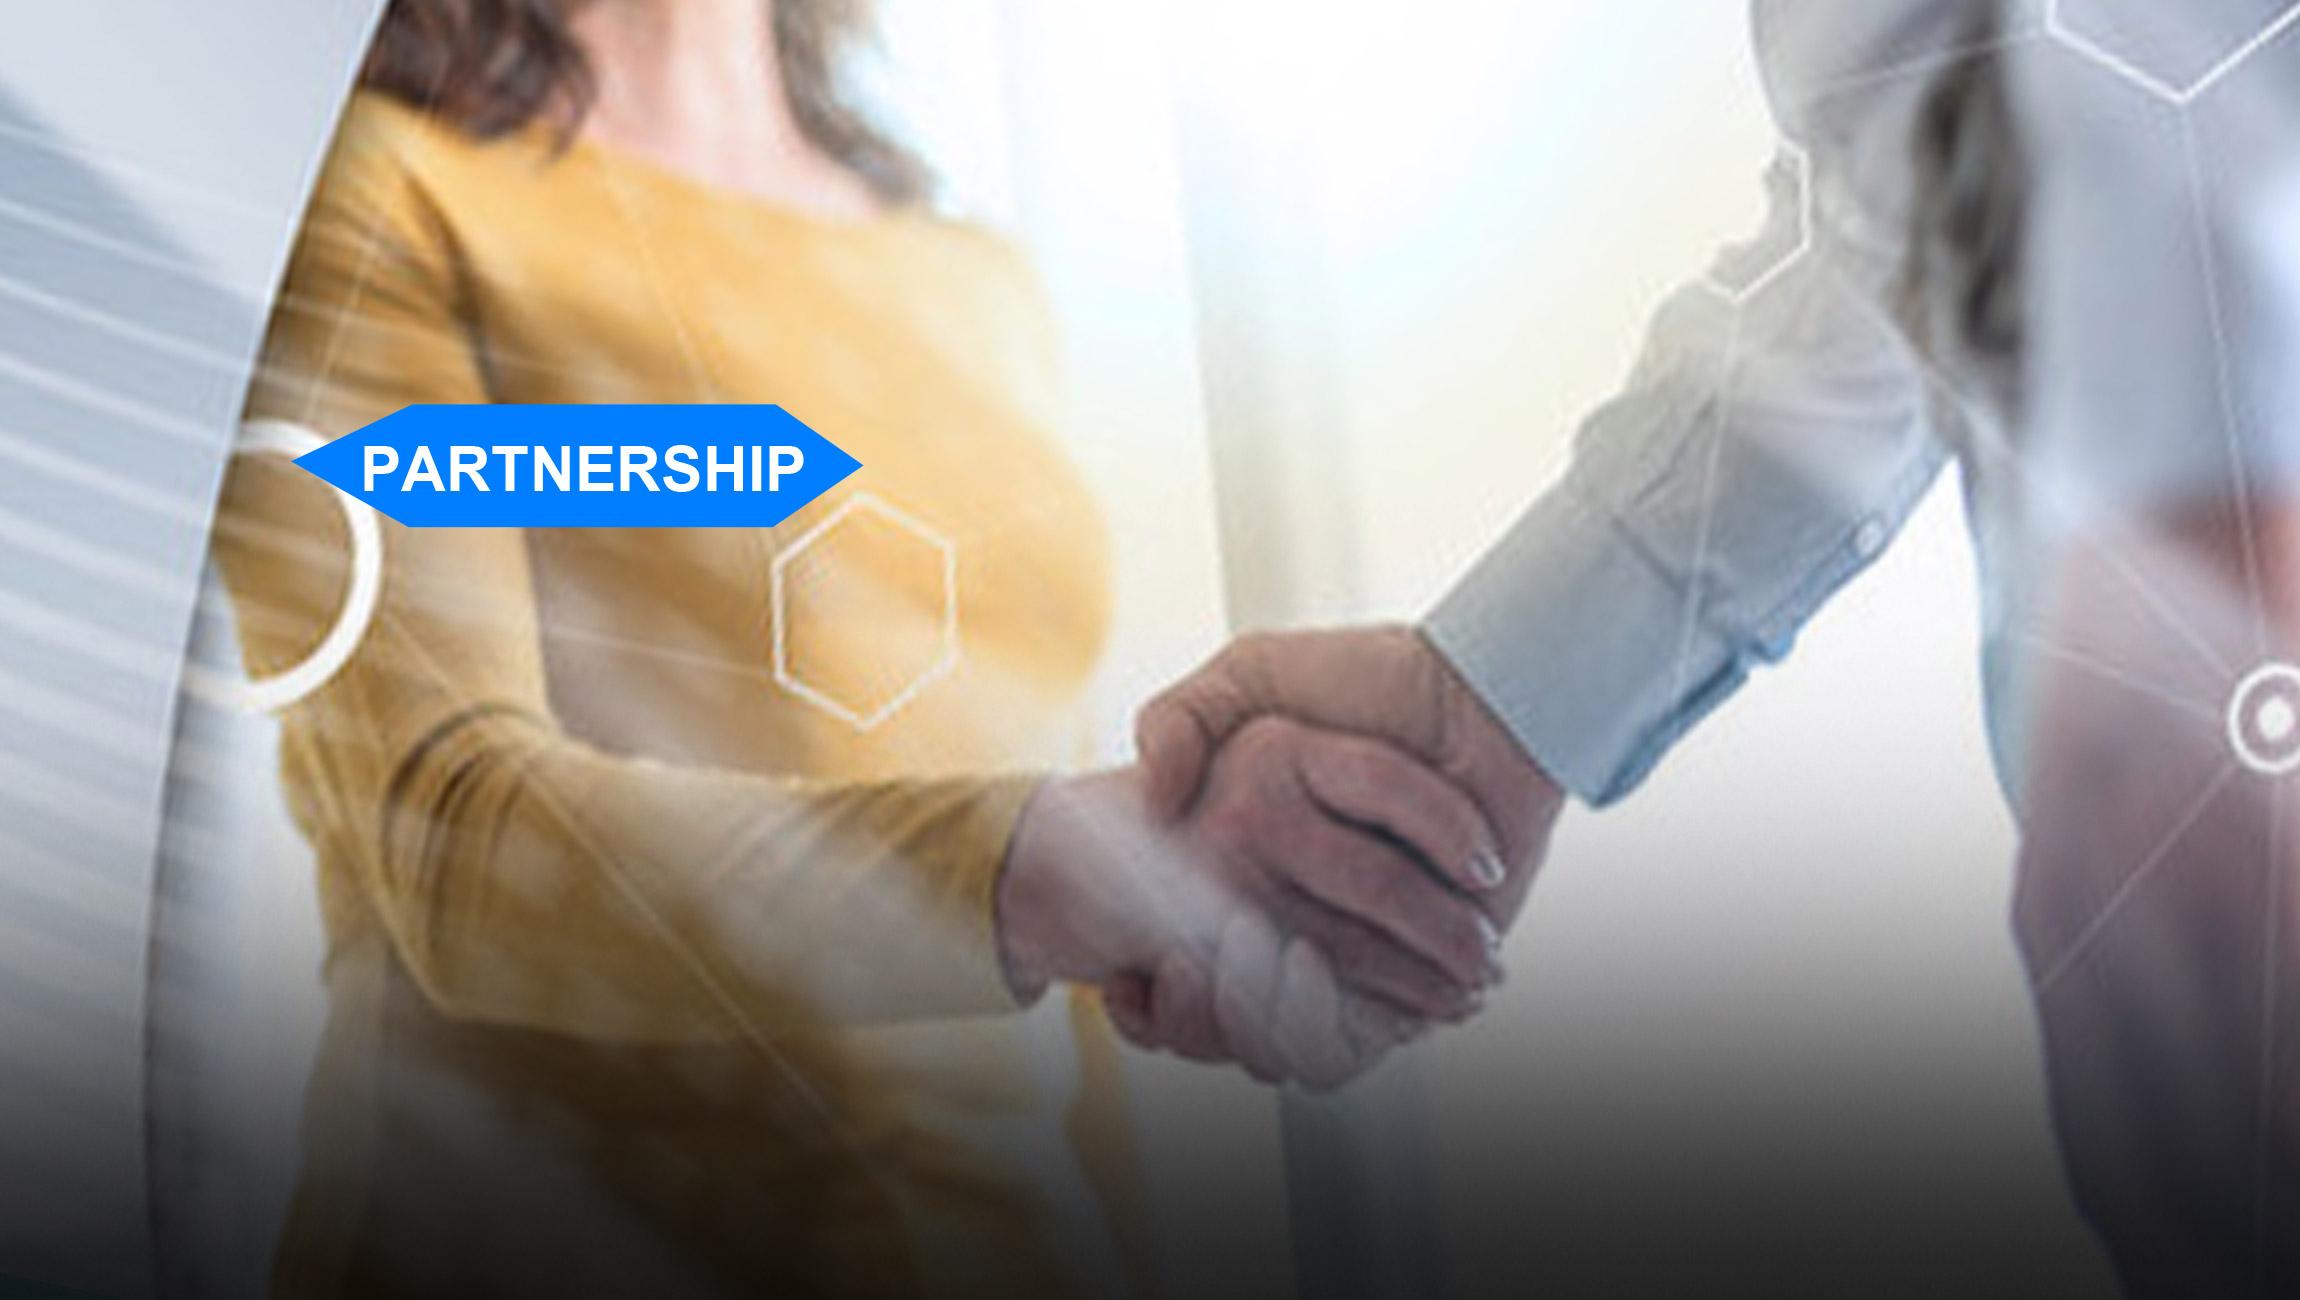 Slalom Joins the Alida Partner Network to Transform Customer Experiences